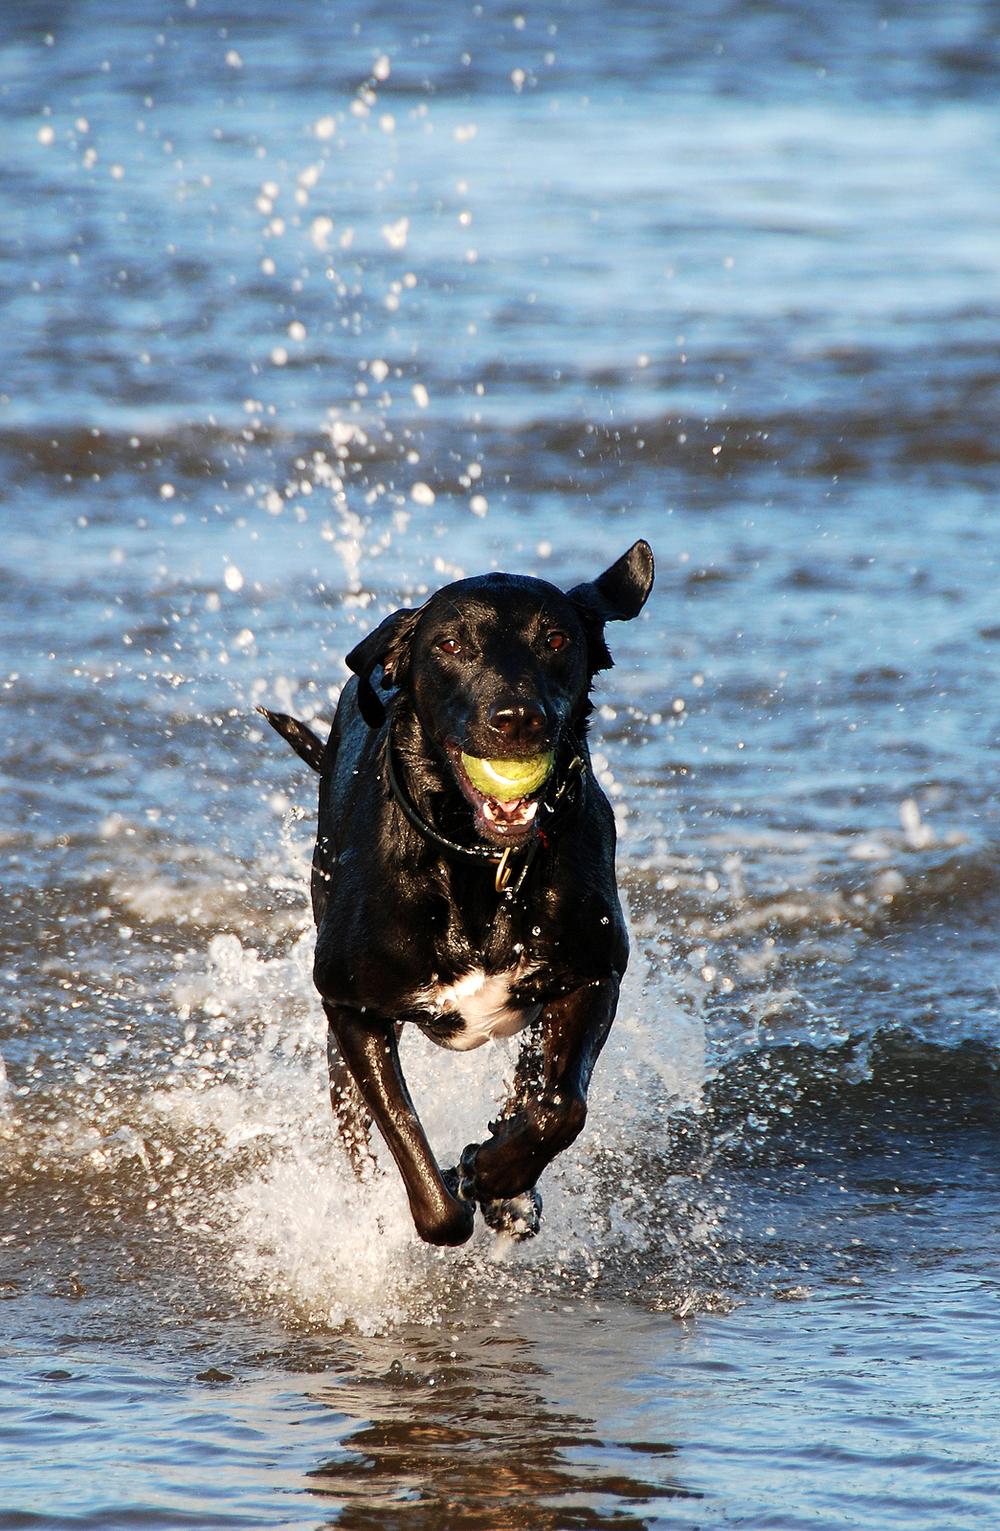 bigstock-Black-Dog-Playing-In-Water-5182279.jpg